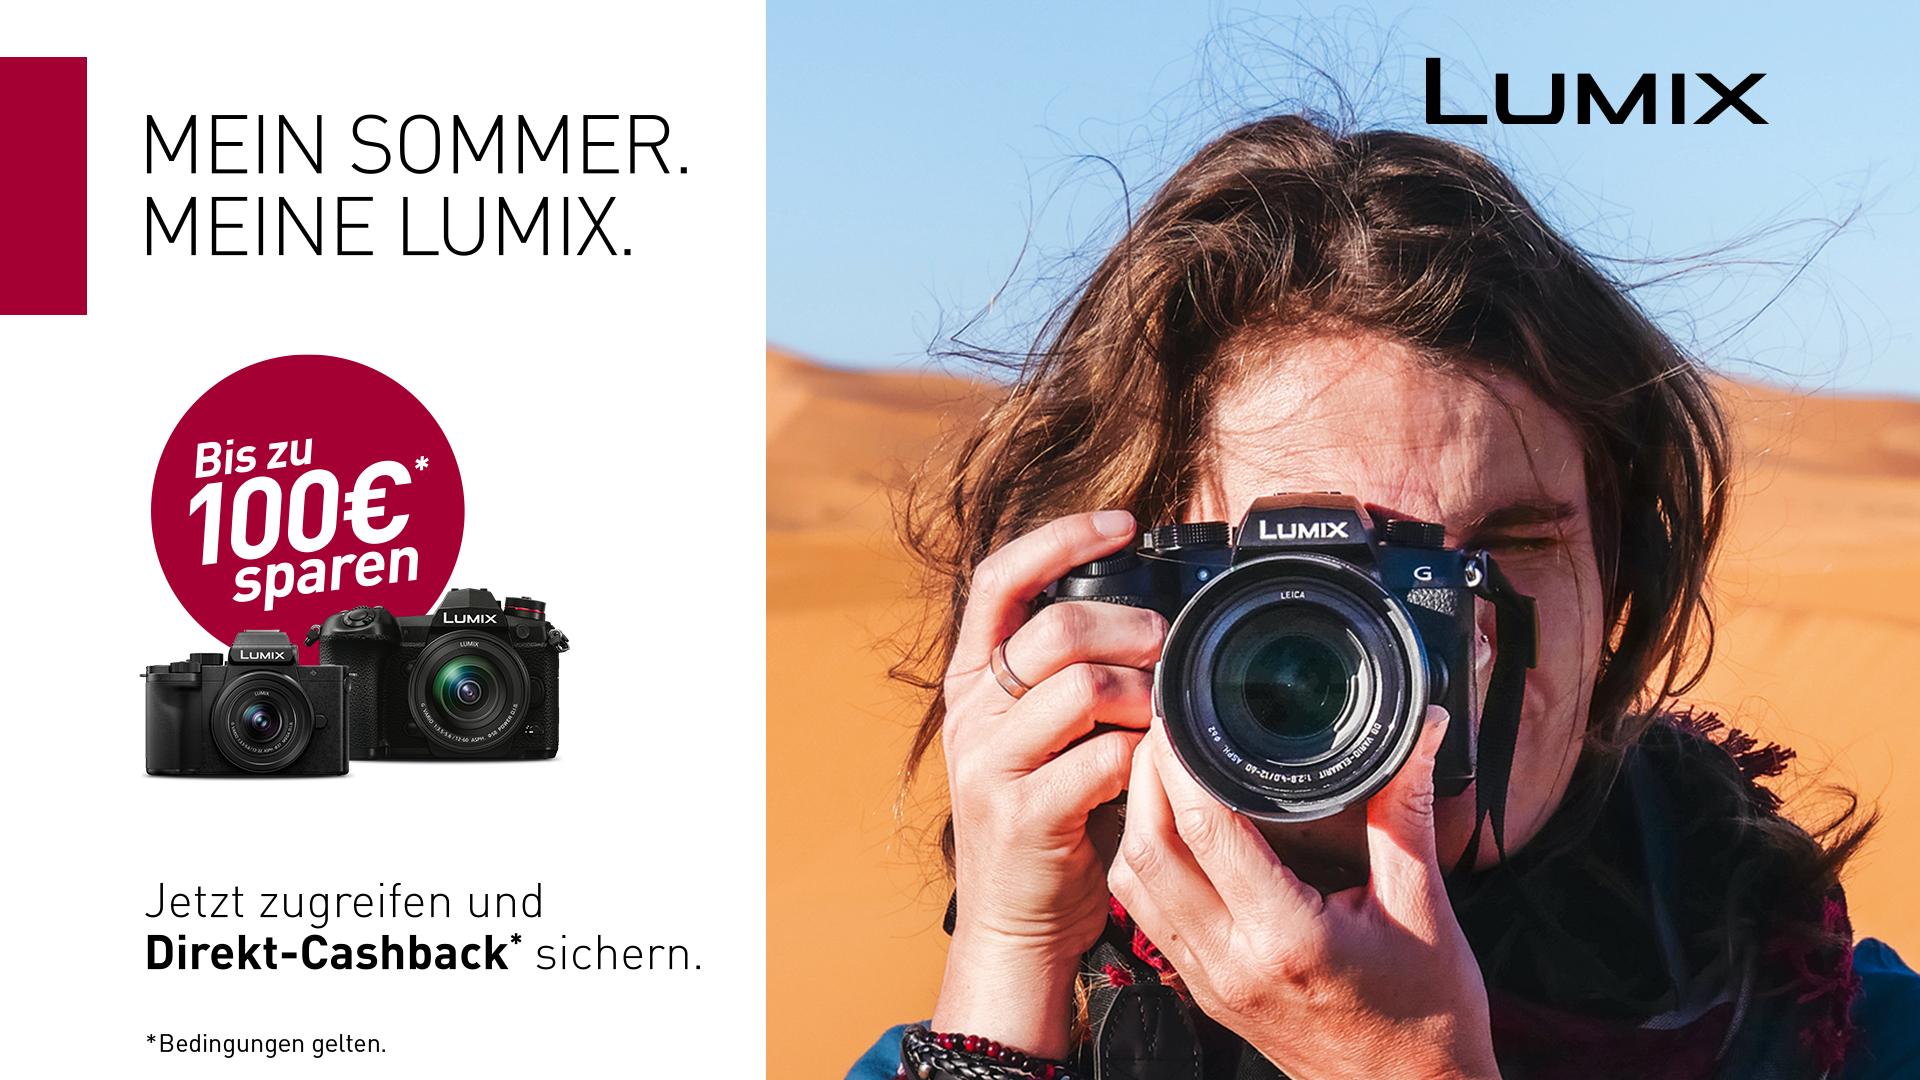 Panasonic Lumix Direkt Cashback